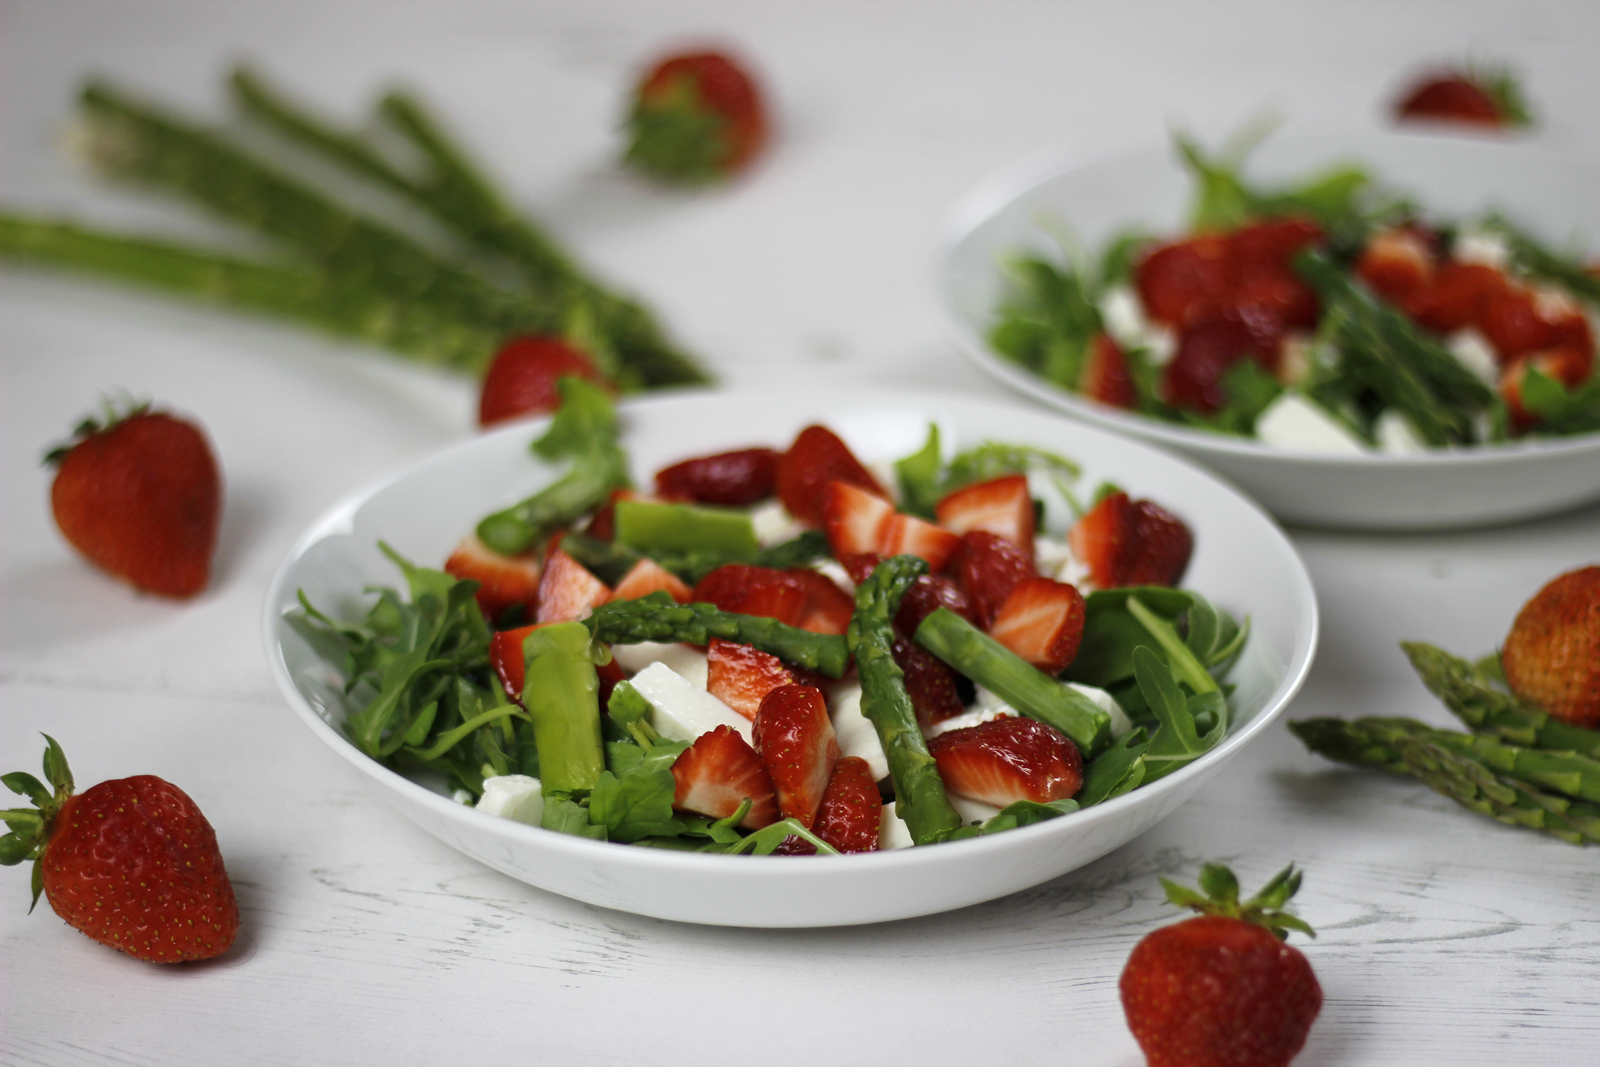 Spargel-Erdbeer-Feta-Salat mit Zitronendressing 03